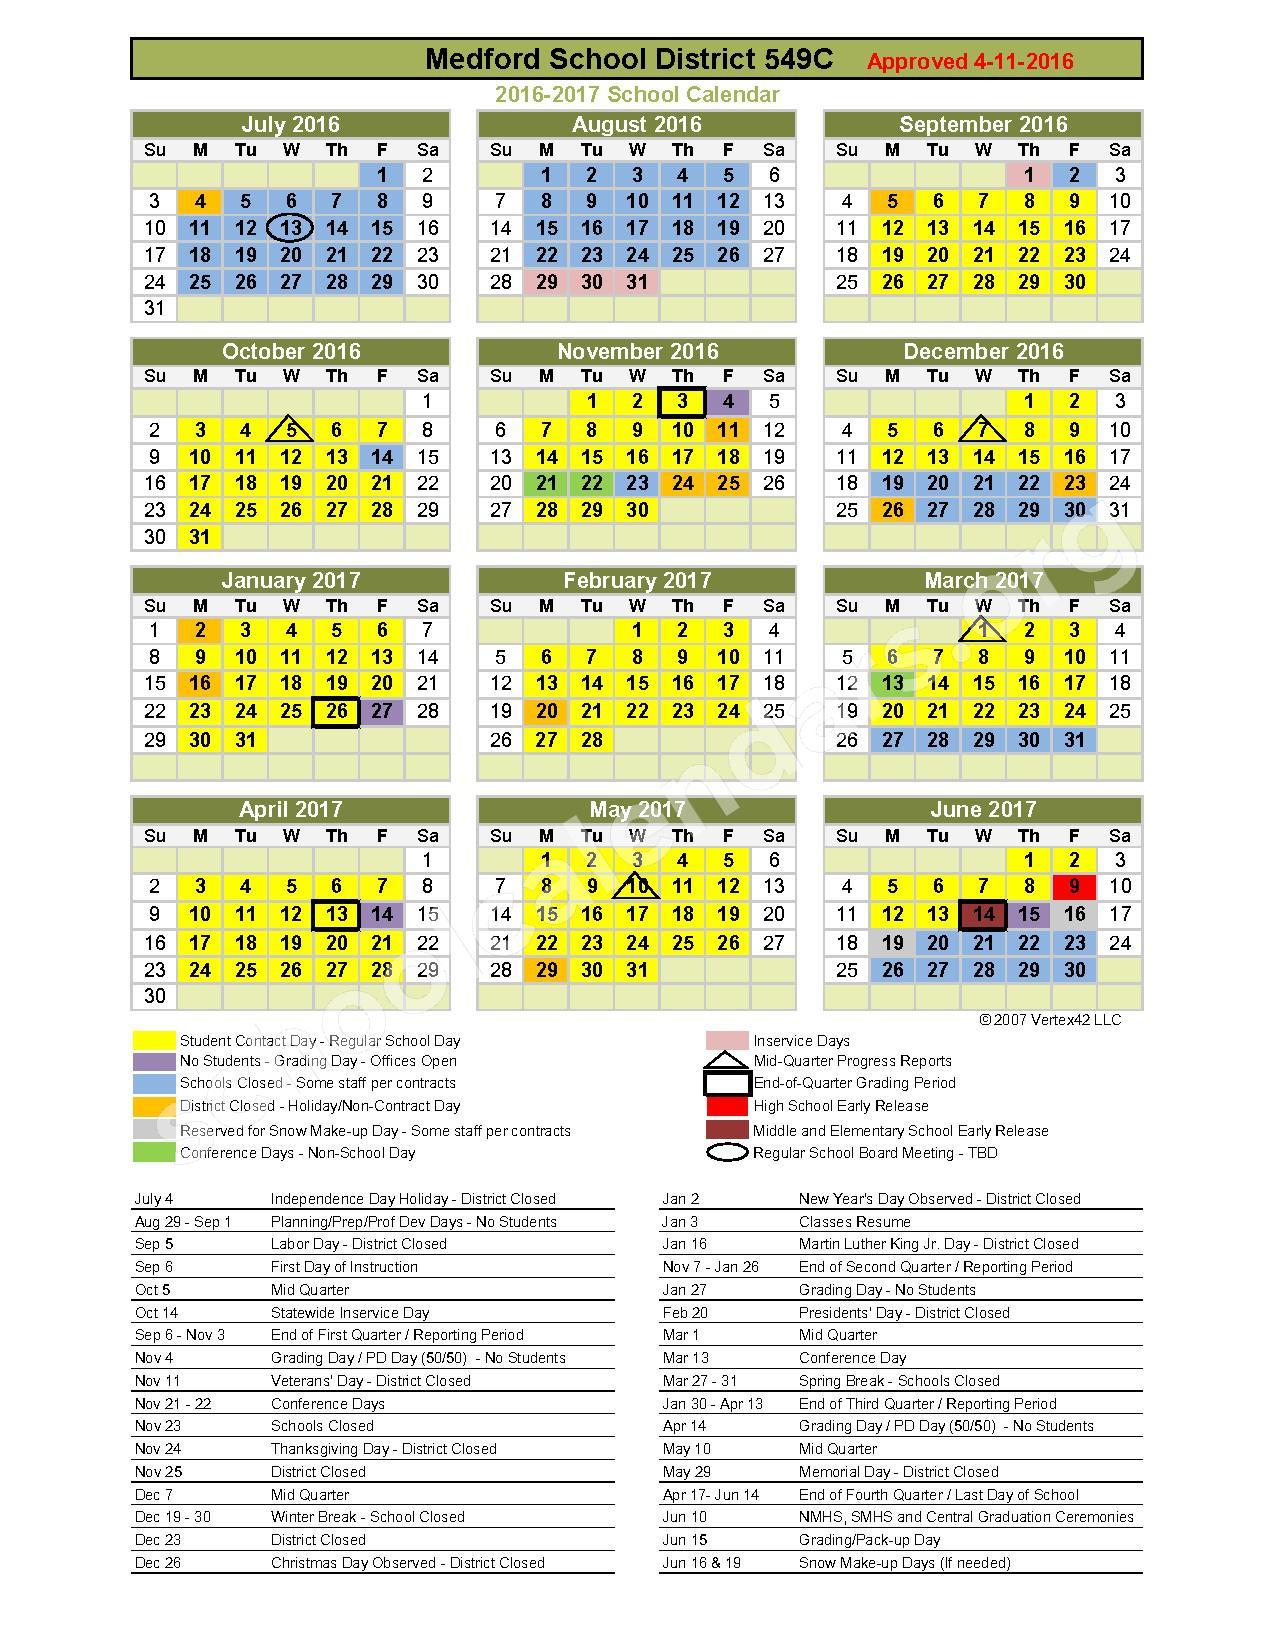 2016 - 2017 District Calendar – Medford School District 549C – page 1